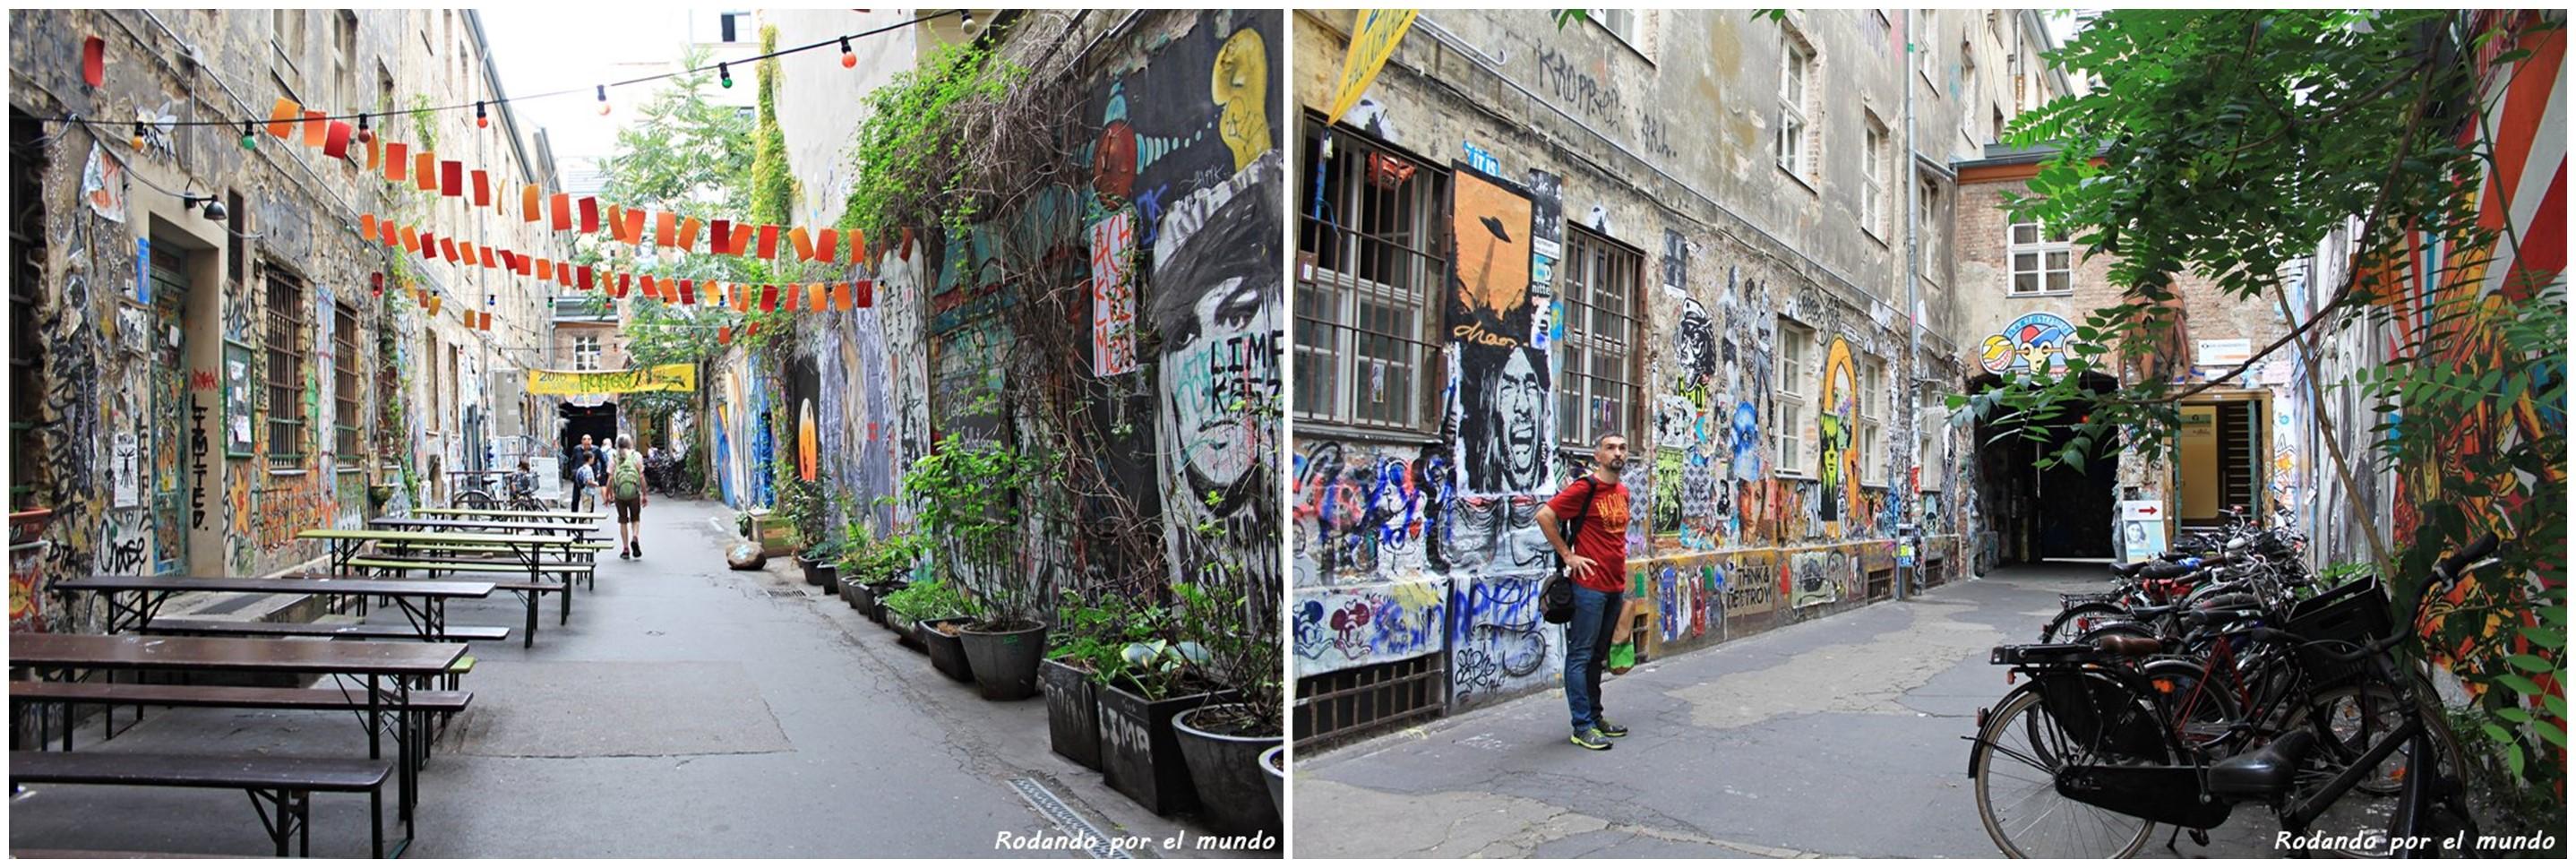 Dead Chicken Alley Berlin